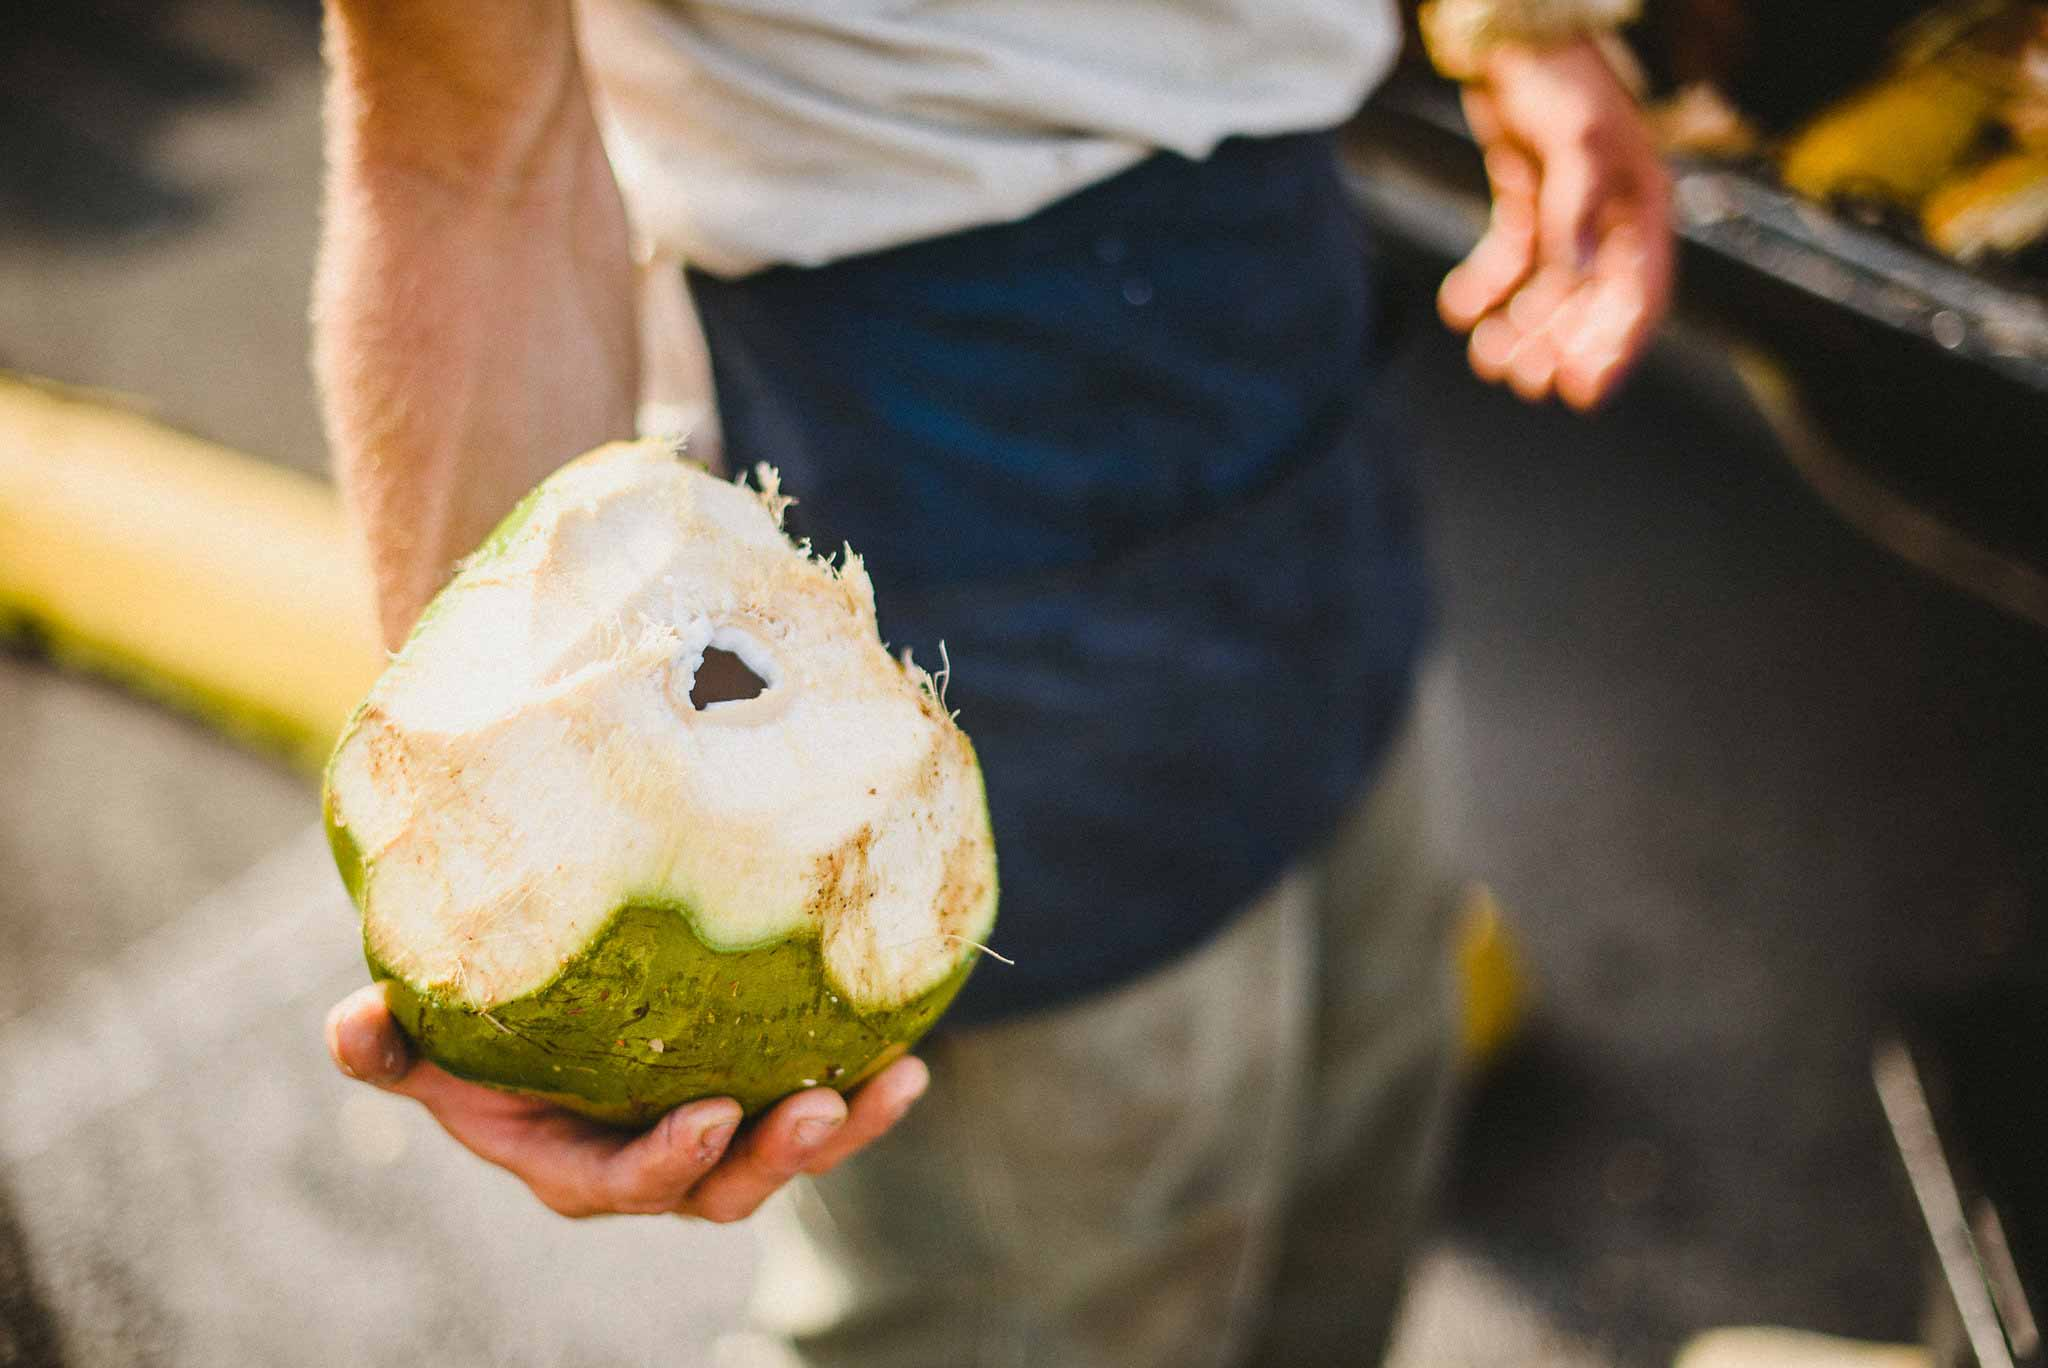 Keauhou-Farmers-Market-Kona-fresh-cut-coconut.jpg